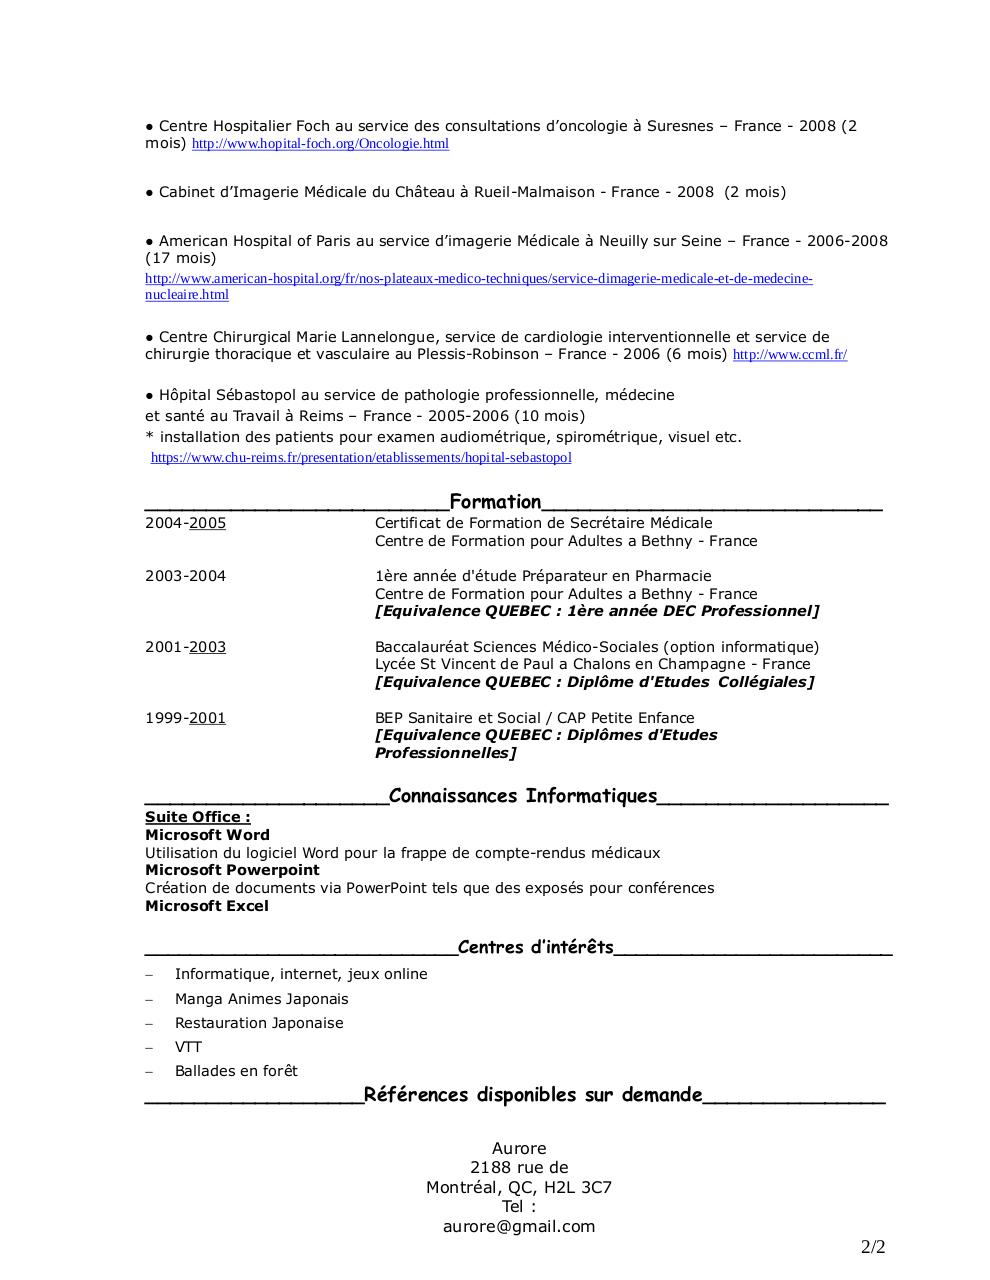 cv secr u00e9taire m u00e9dicale aurore pdf pvtistes pdf par aurore